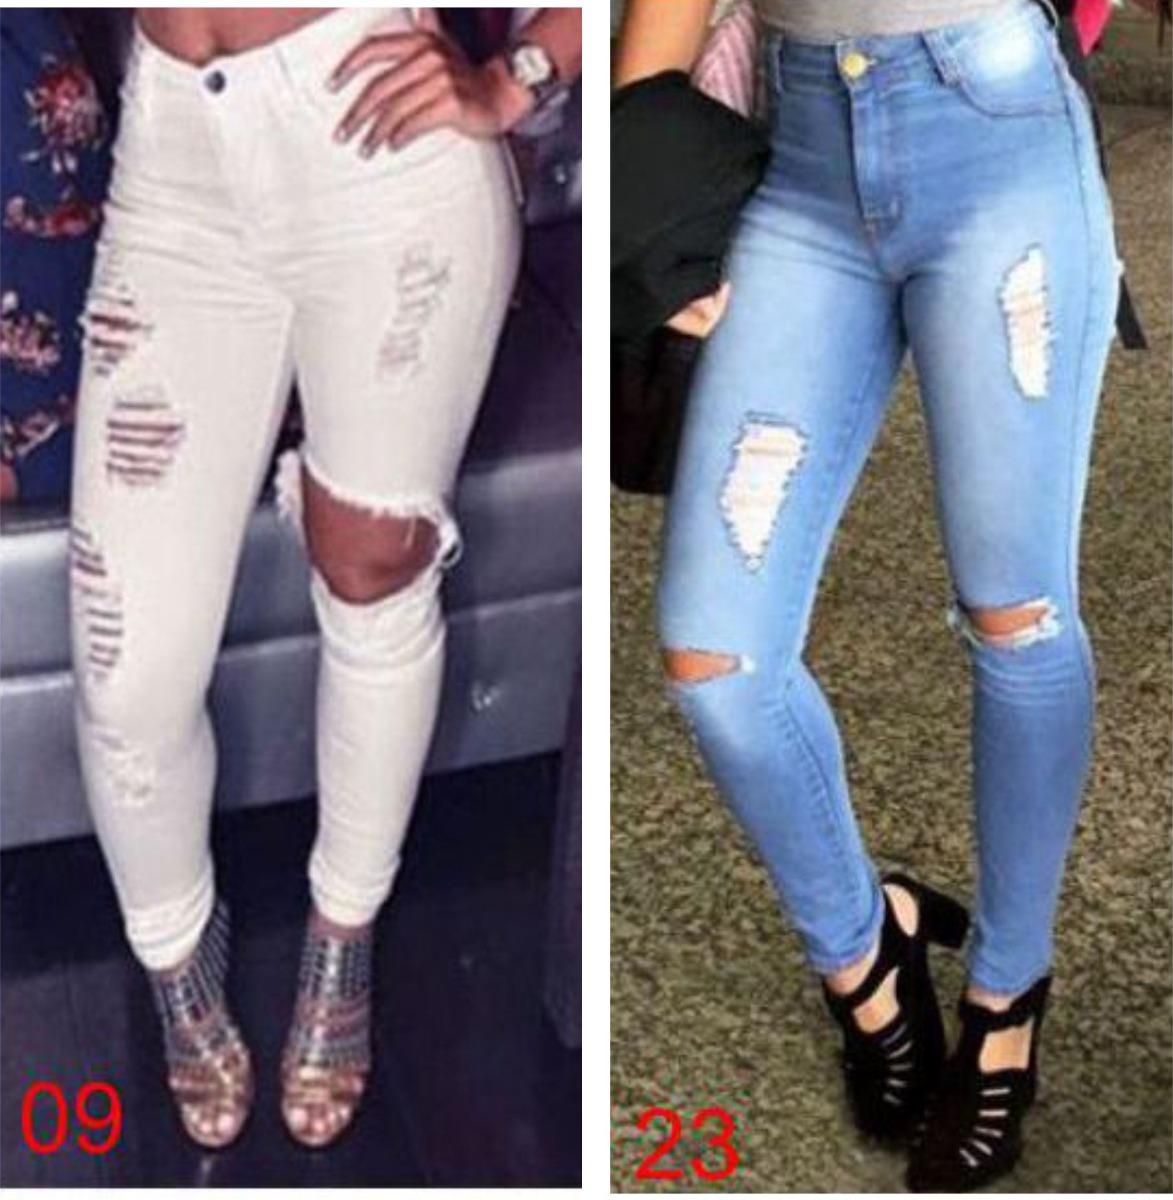 f43b20f14 kit 2 calças jeans cintura alta roupa feminina rasgos dins. Carregando zoom.